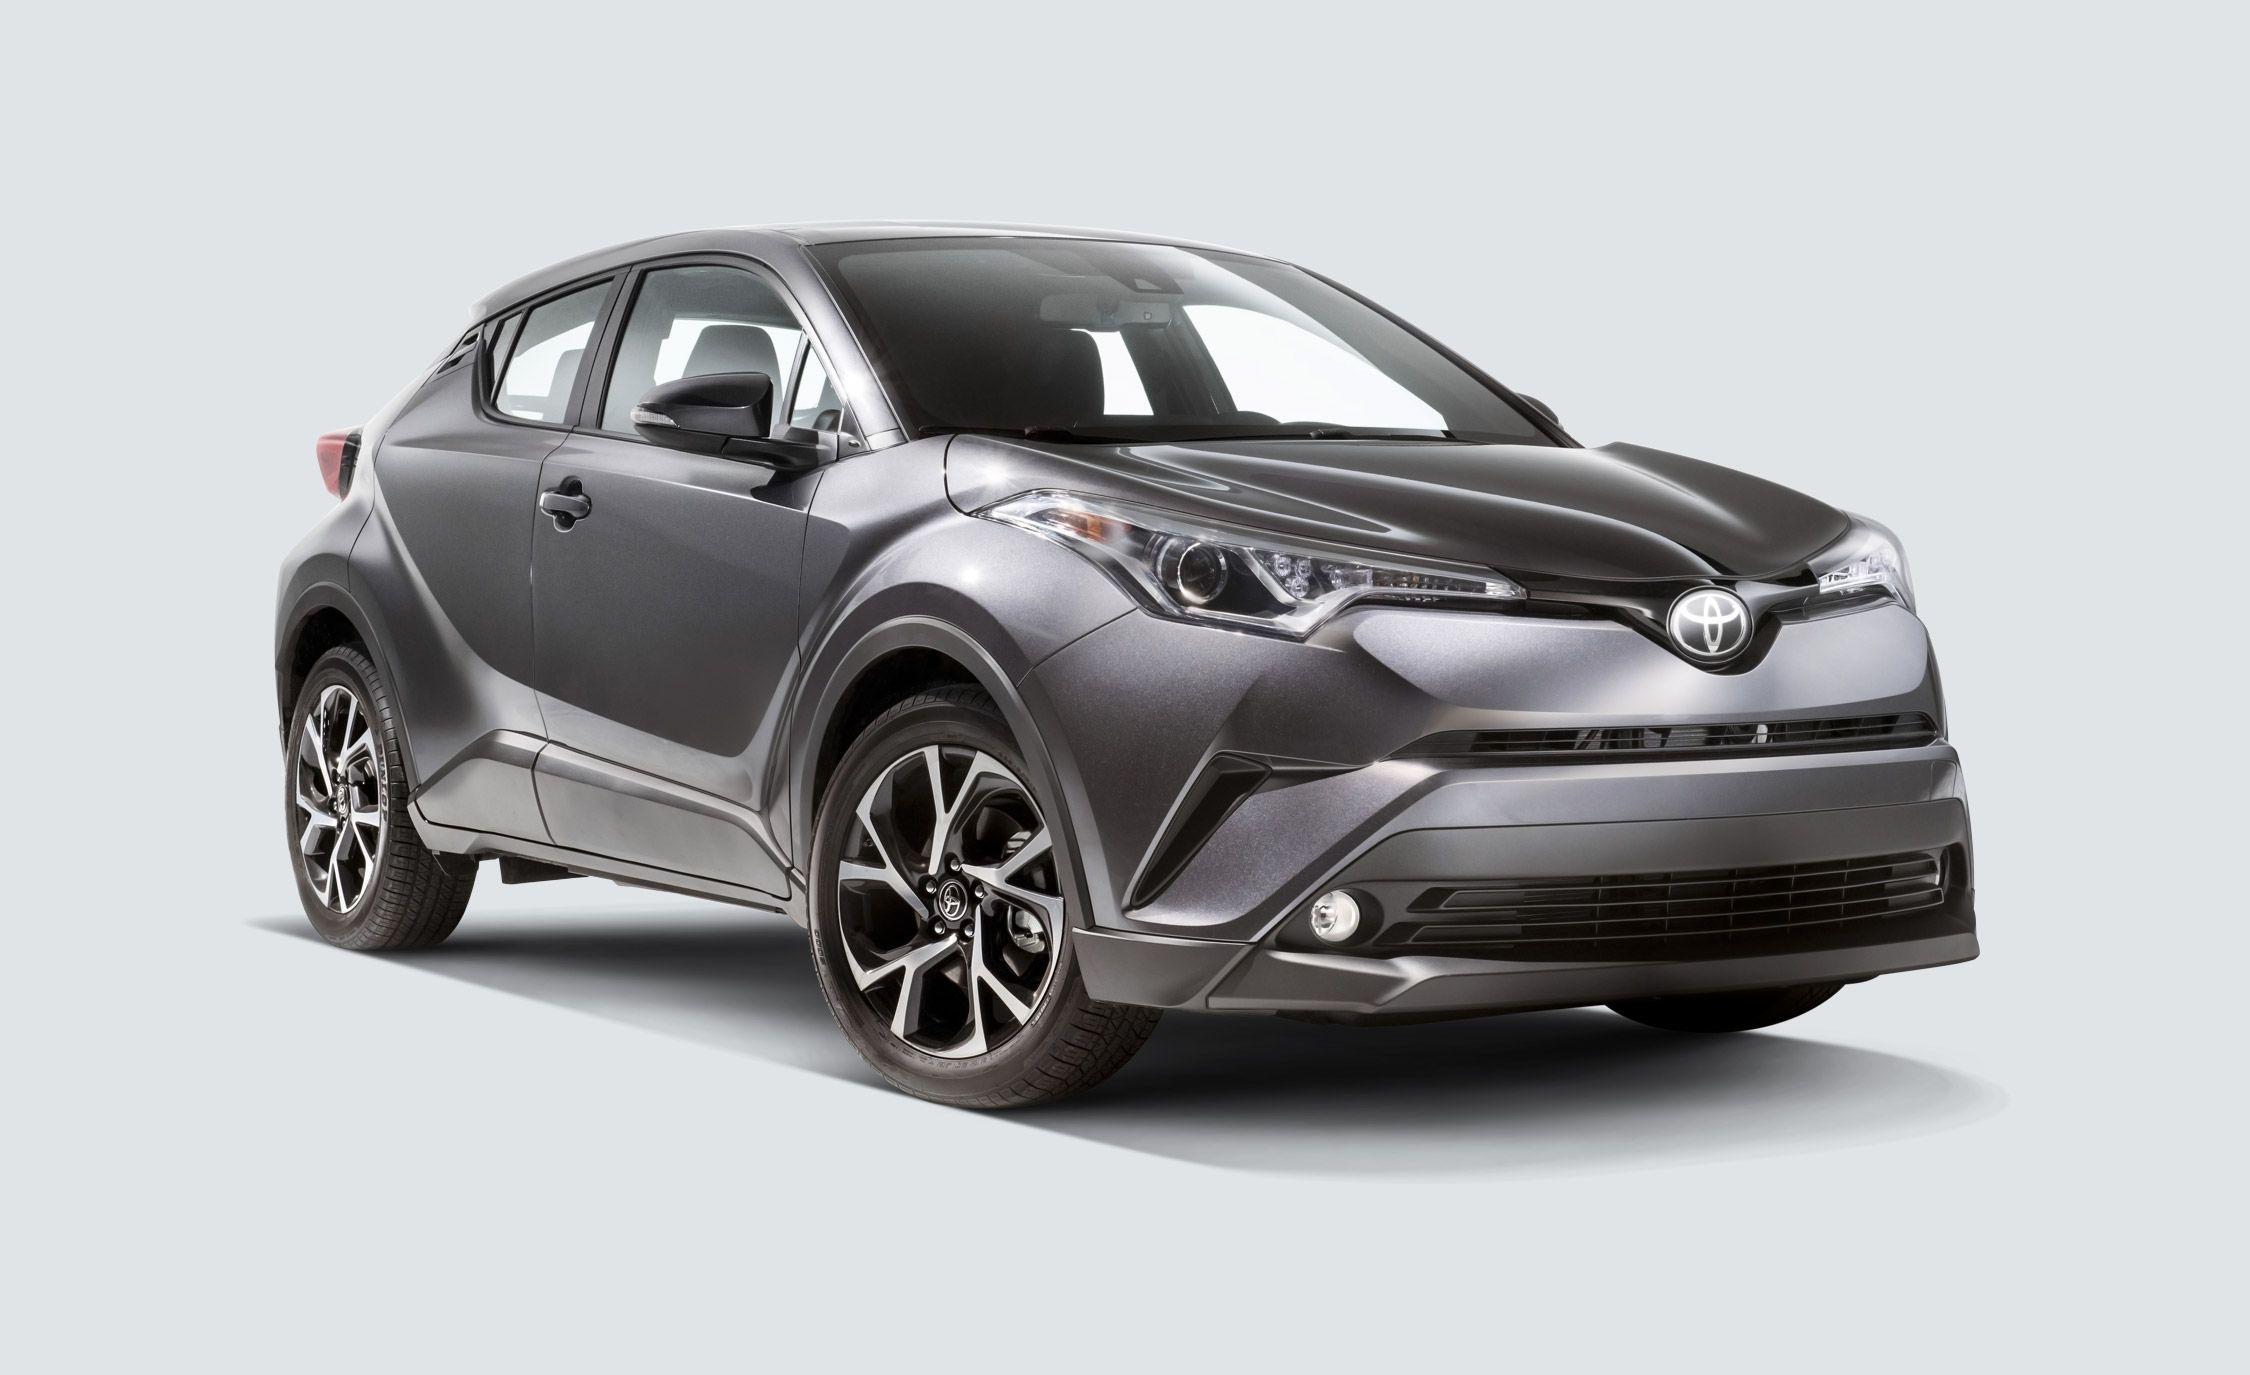 2018 Toyota C-HR: Funky Looks, Mainstream Mission